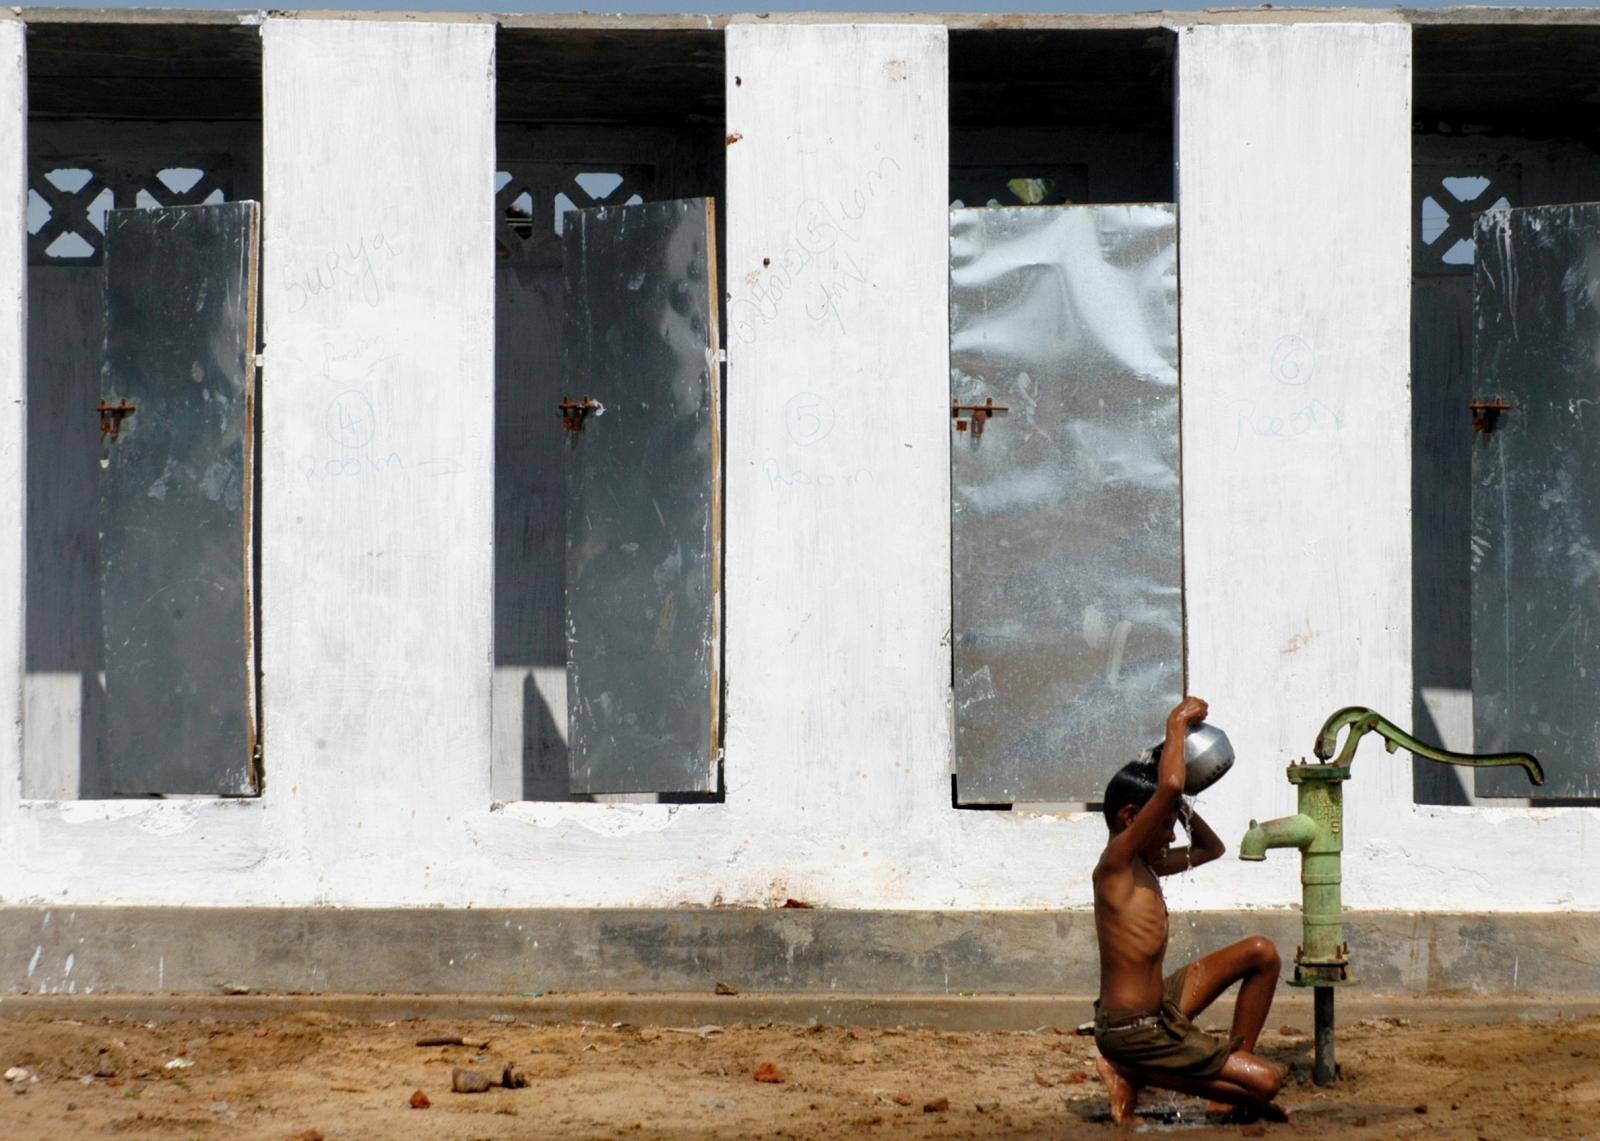 India Nitin Gadkari urine